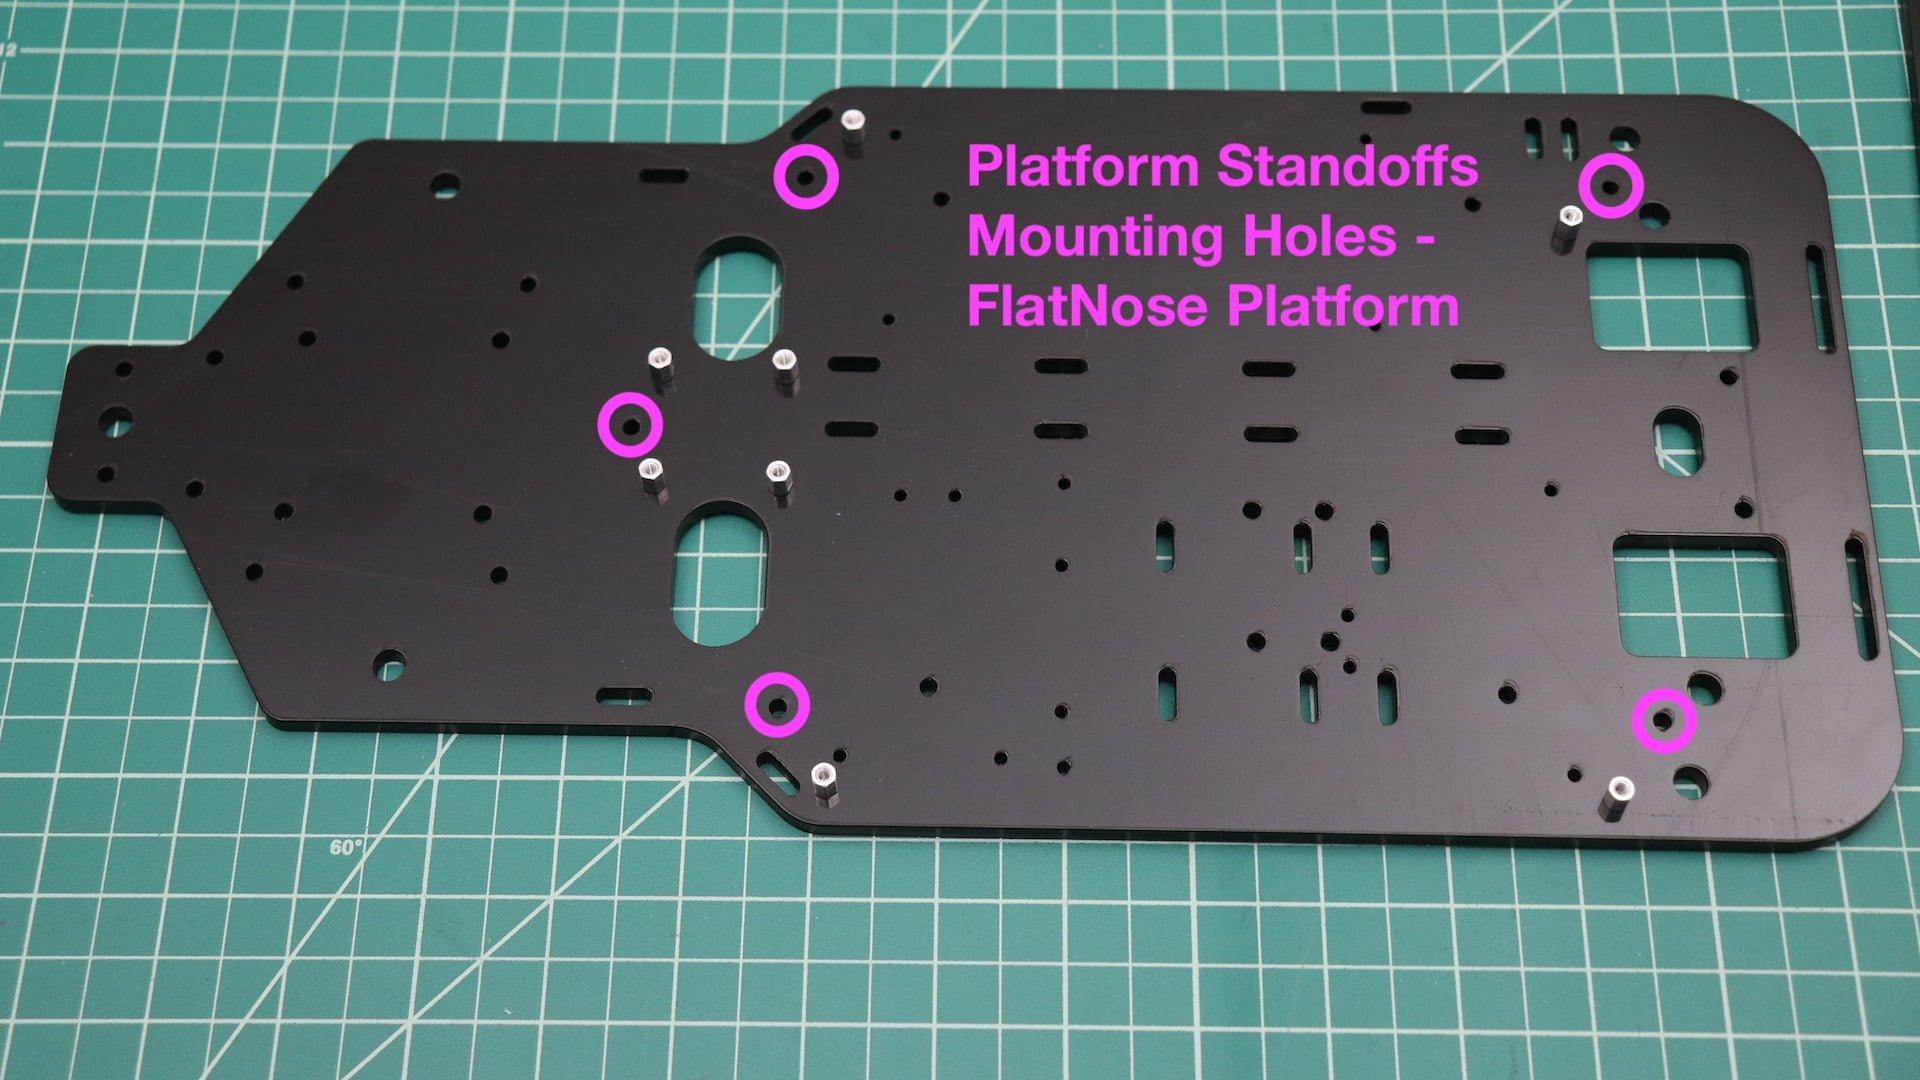 Platform Standoff Mounting Holes